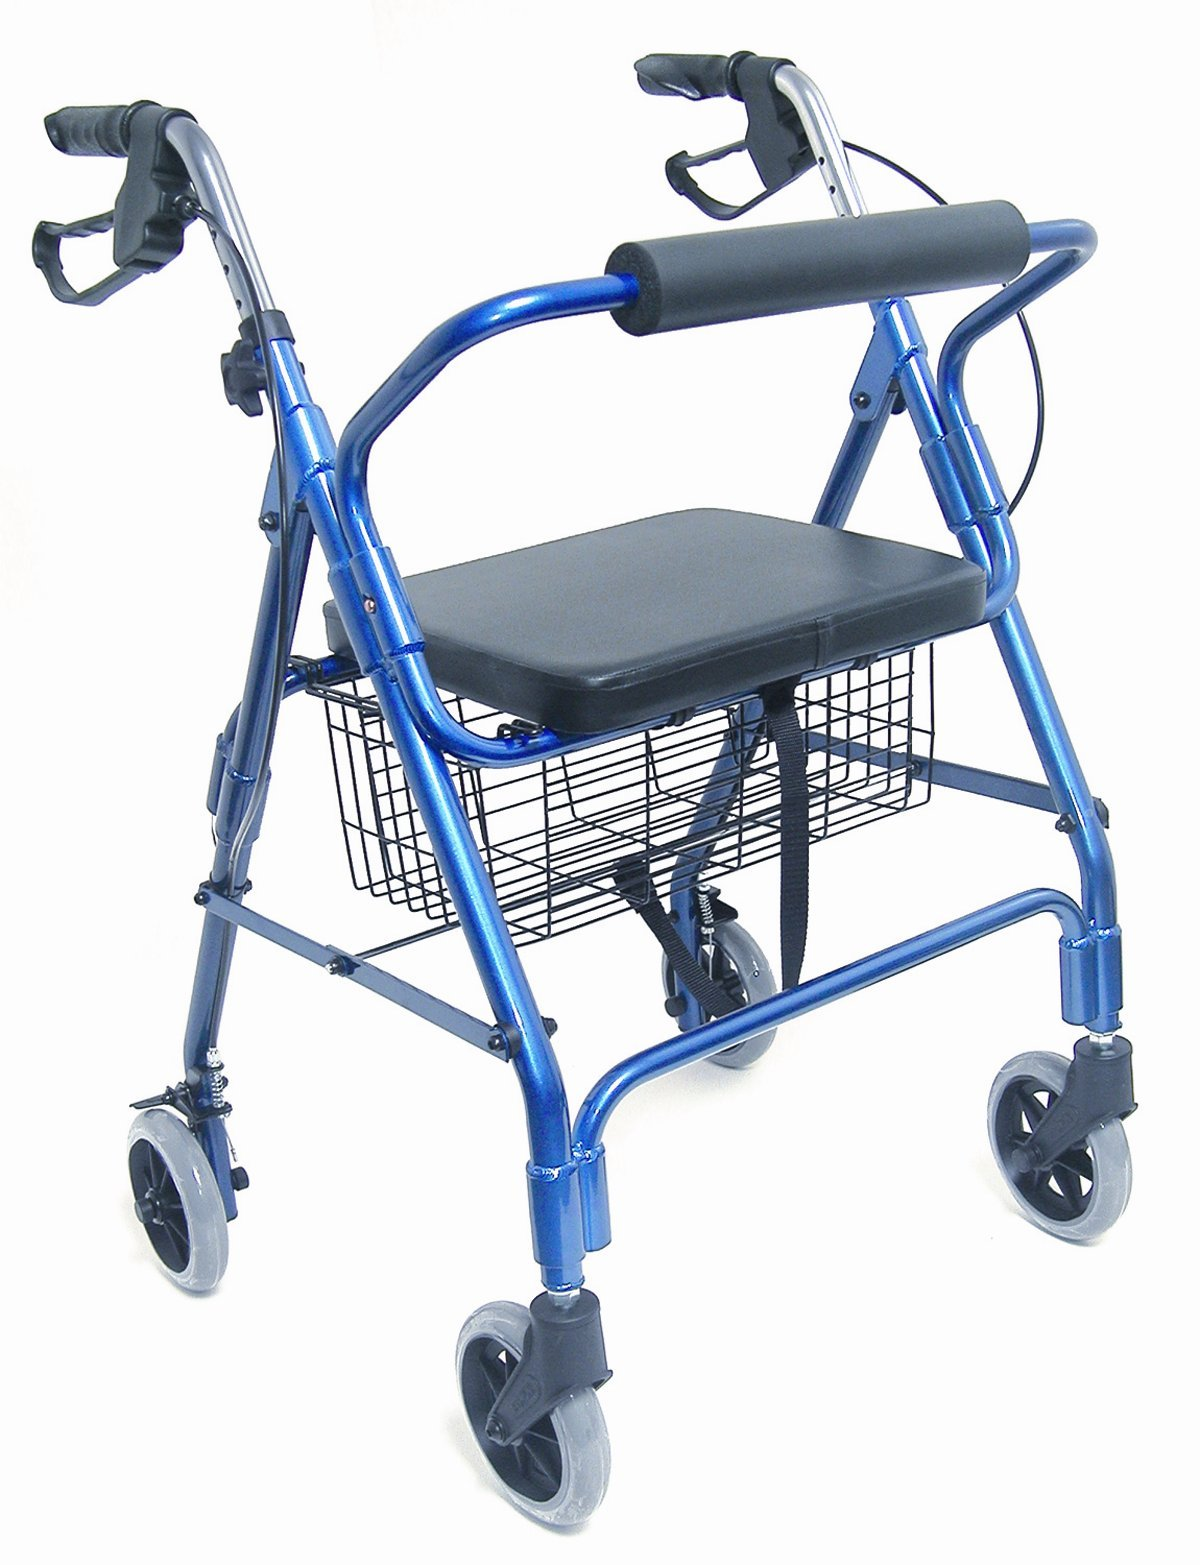 Mabis Dmi Healthcare Ultra Lightweight Aluminum Rollator, Royal Blue, One